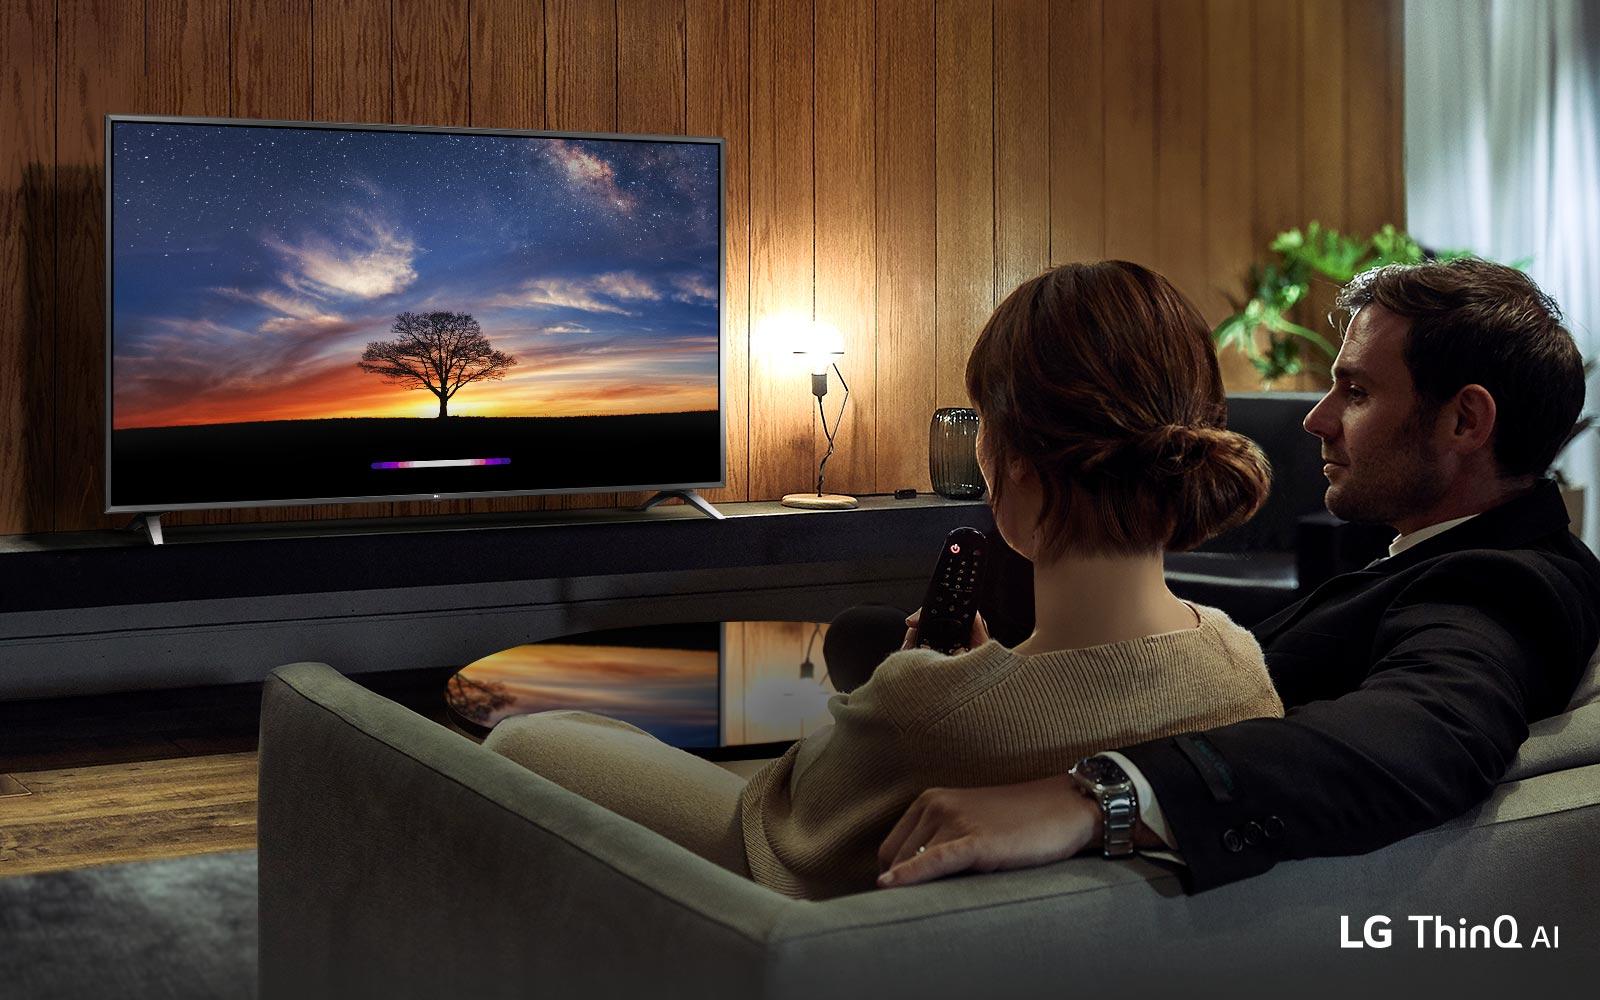 TV-UHD-70-50-UM73-01-AI-ThinQ-Desktop